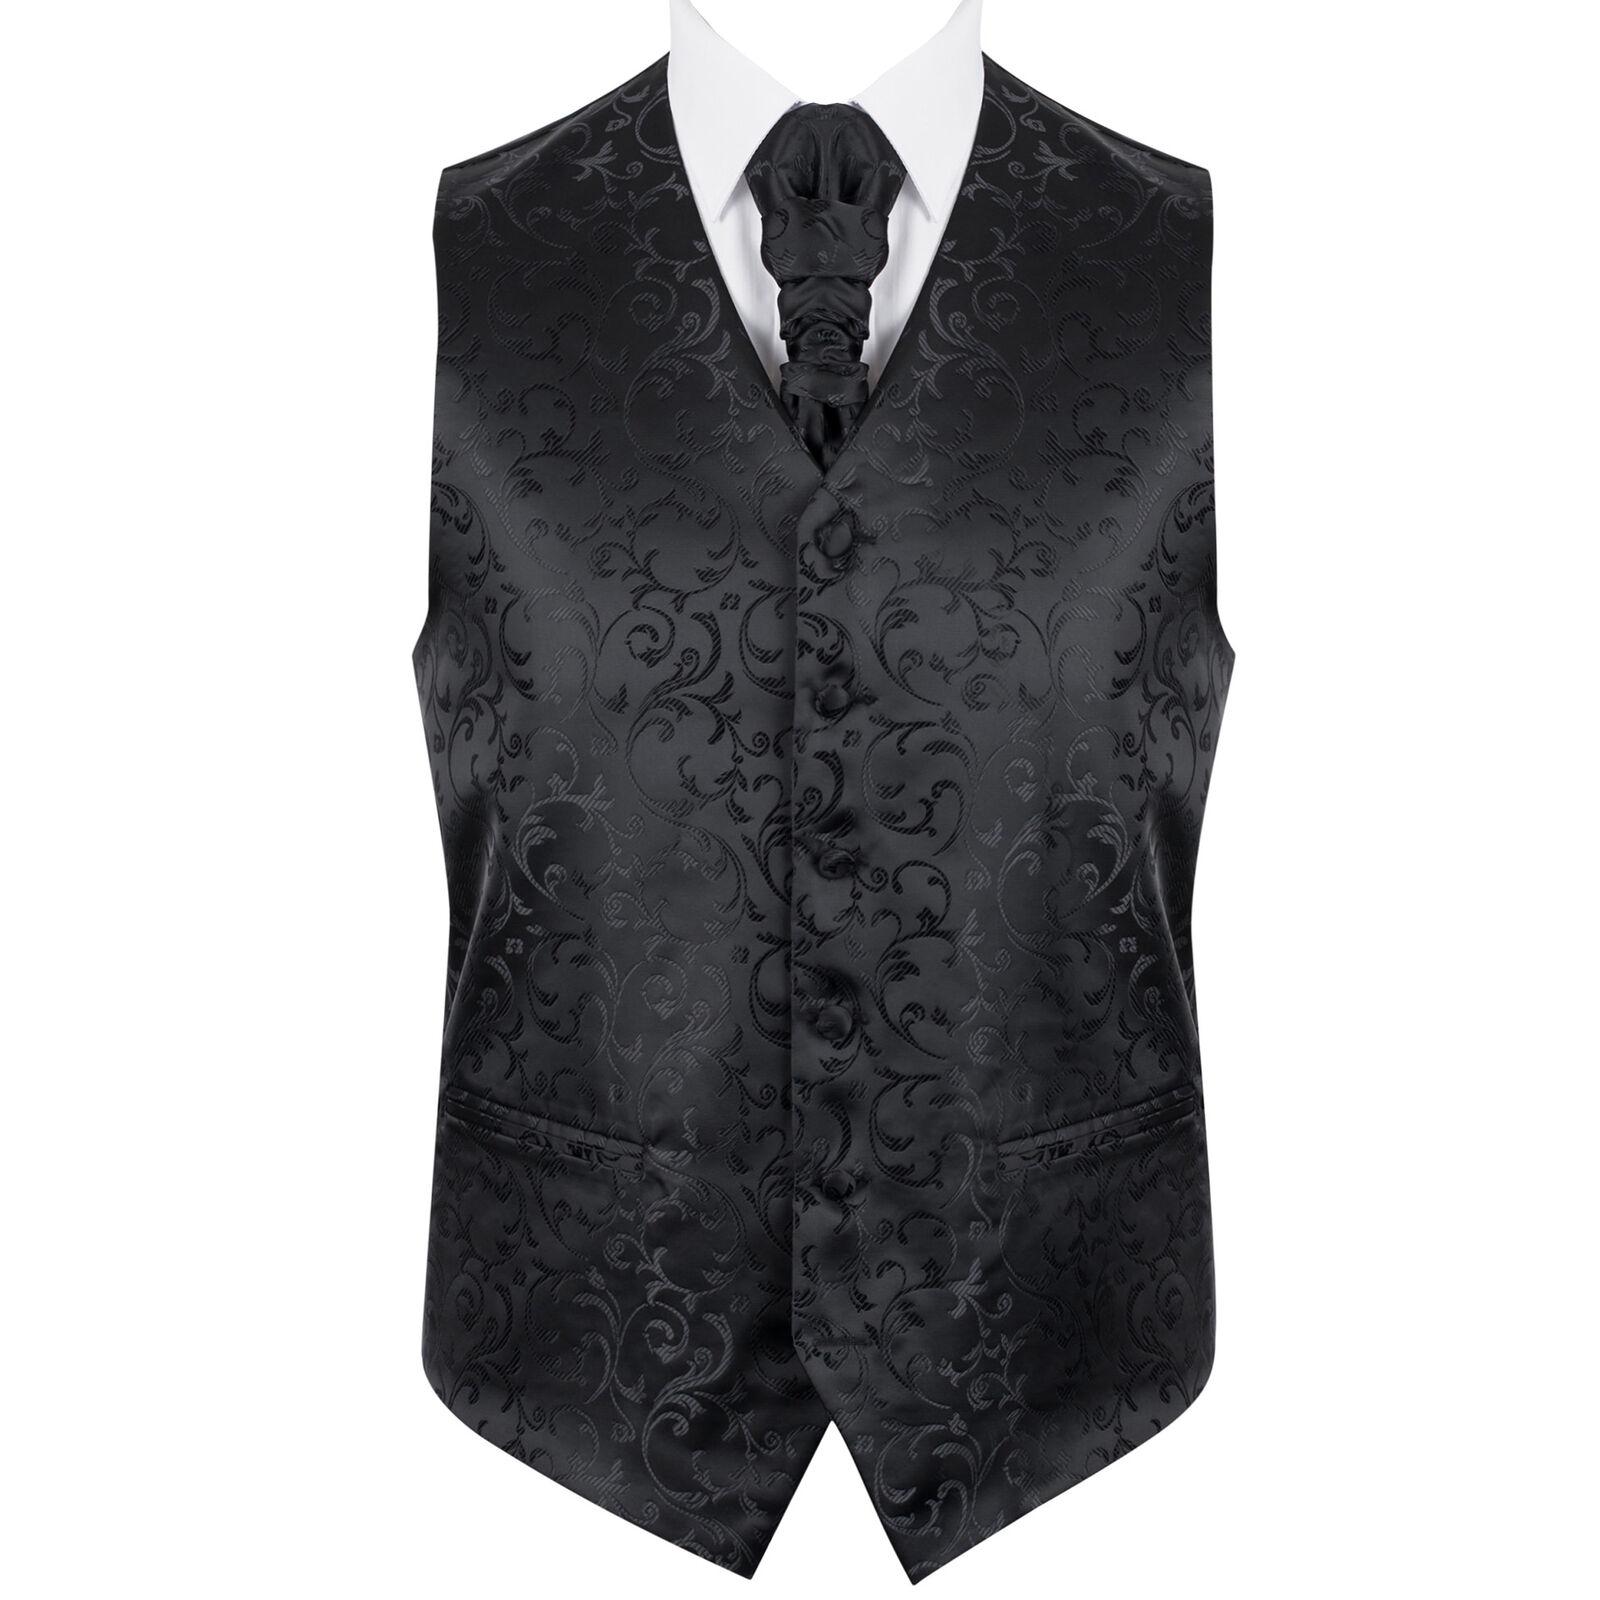 UK Men's Black on Black Wedding Waistcoat Swirl Leaf 6 Button Jacquard Suit Vest